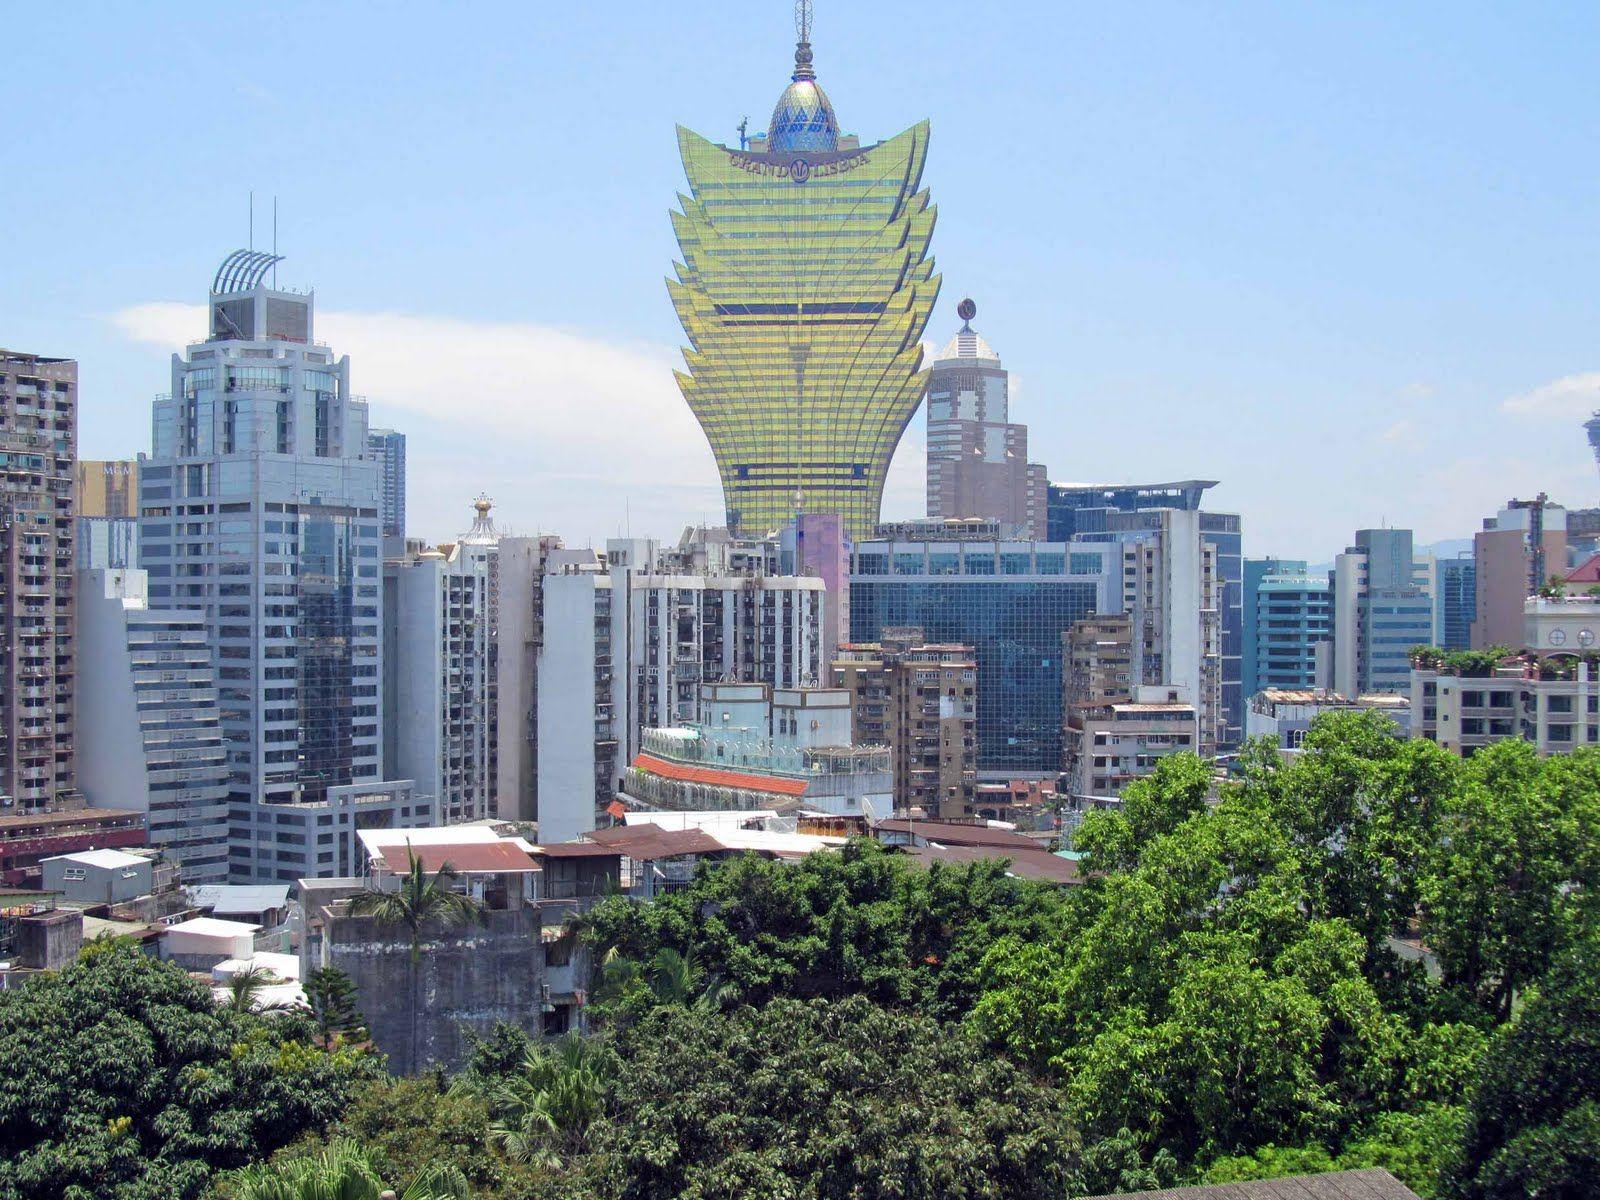 Vegas To Macau Casino vegastomacaucasino  Instagram